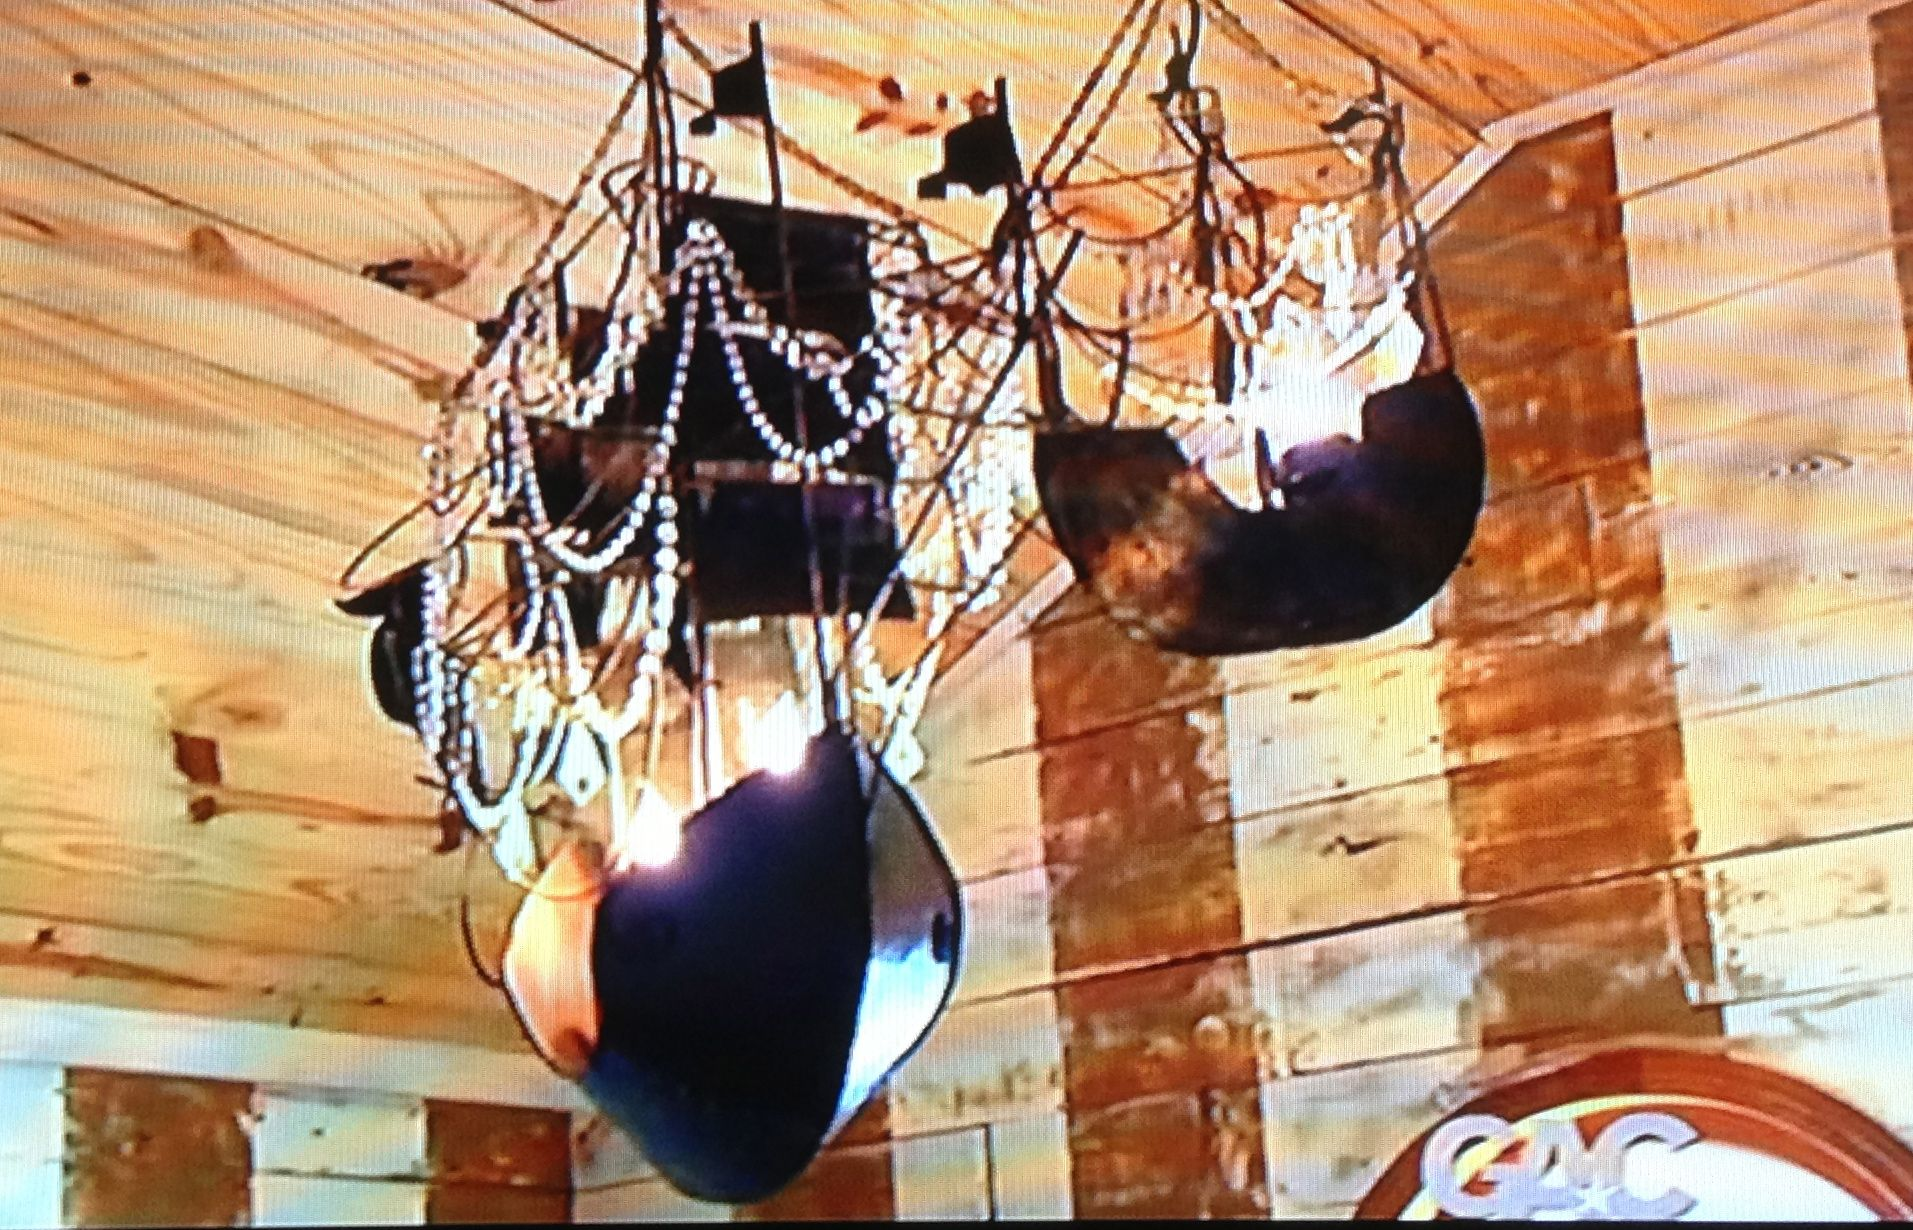 Junk Gypsies pirate ship chandeliers